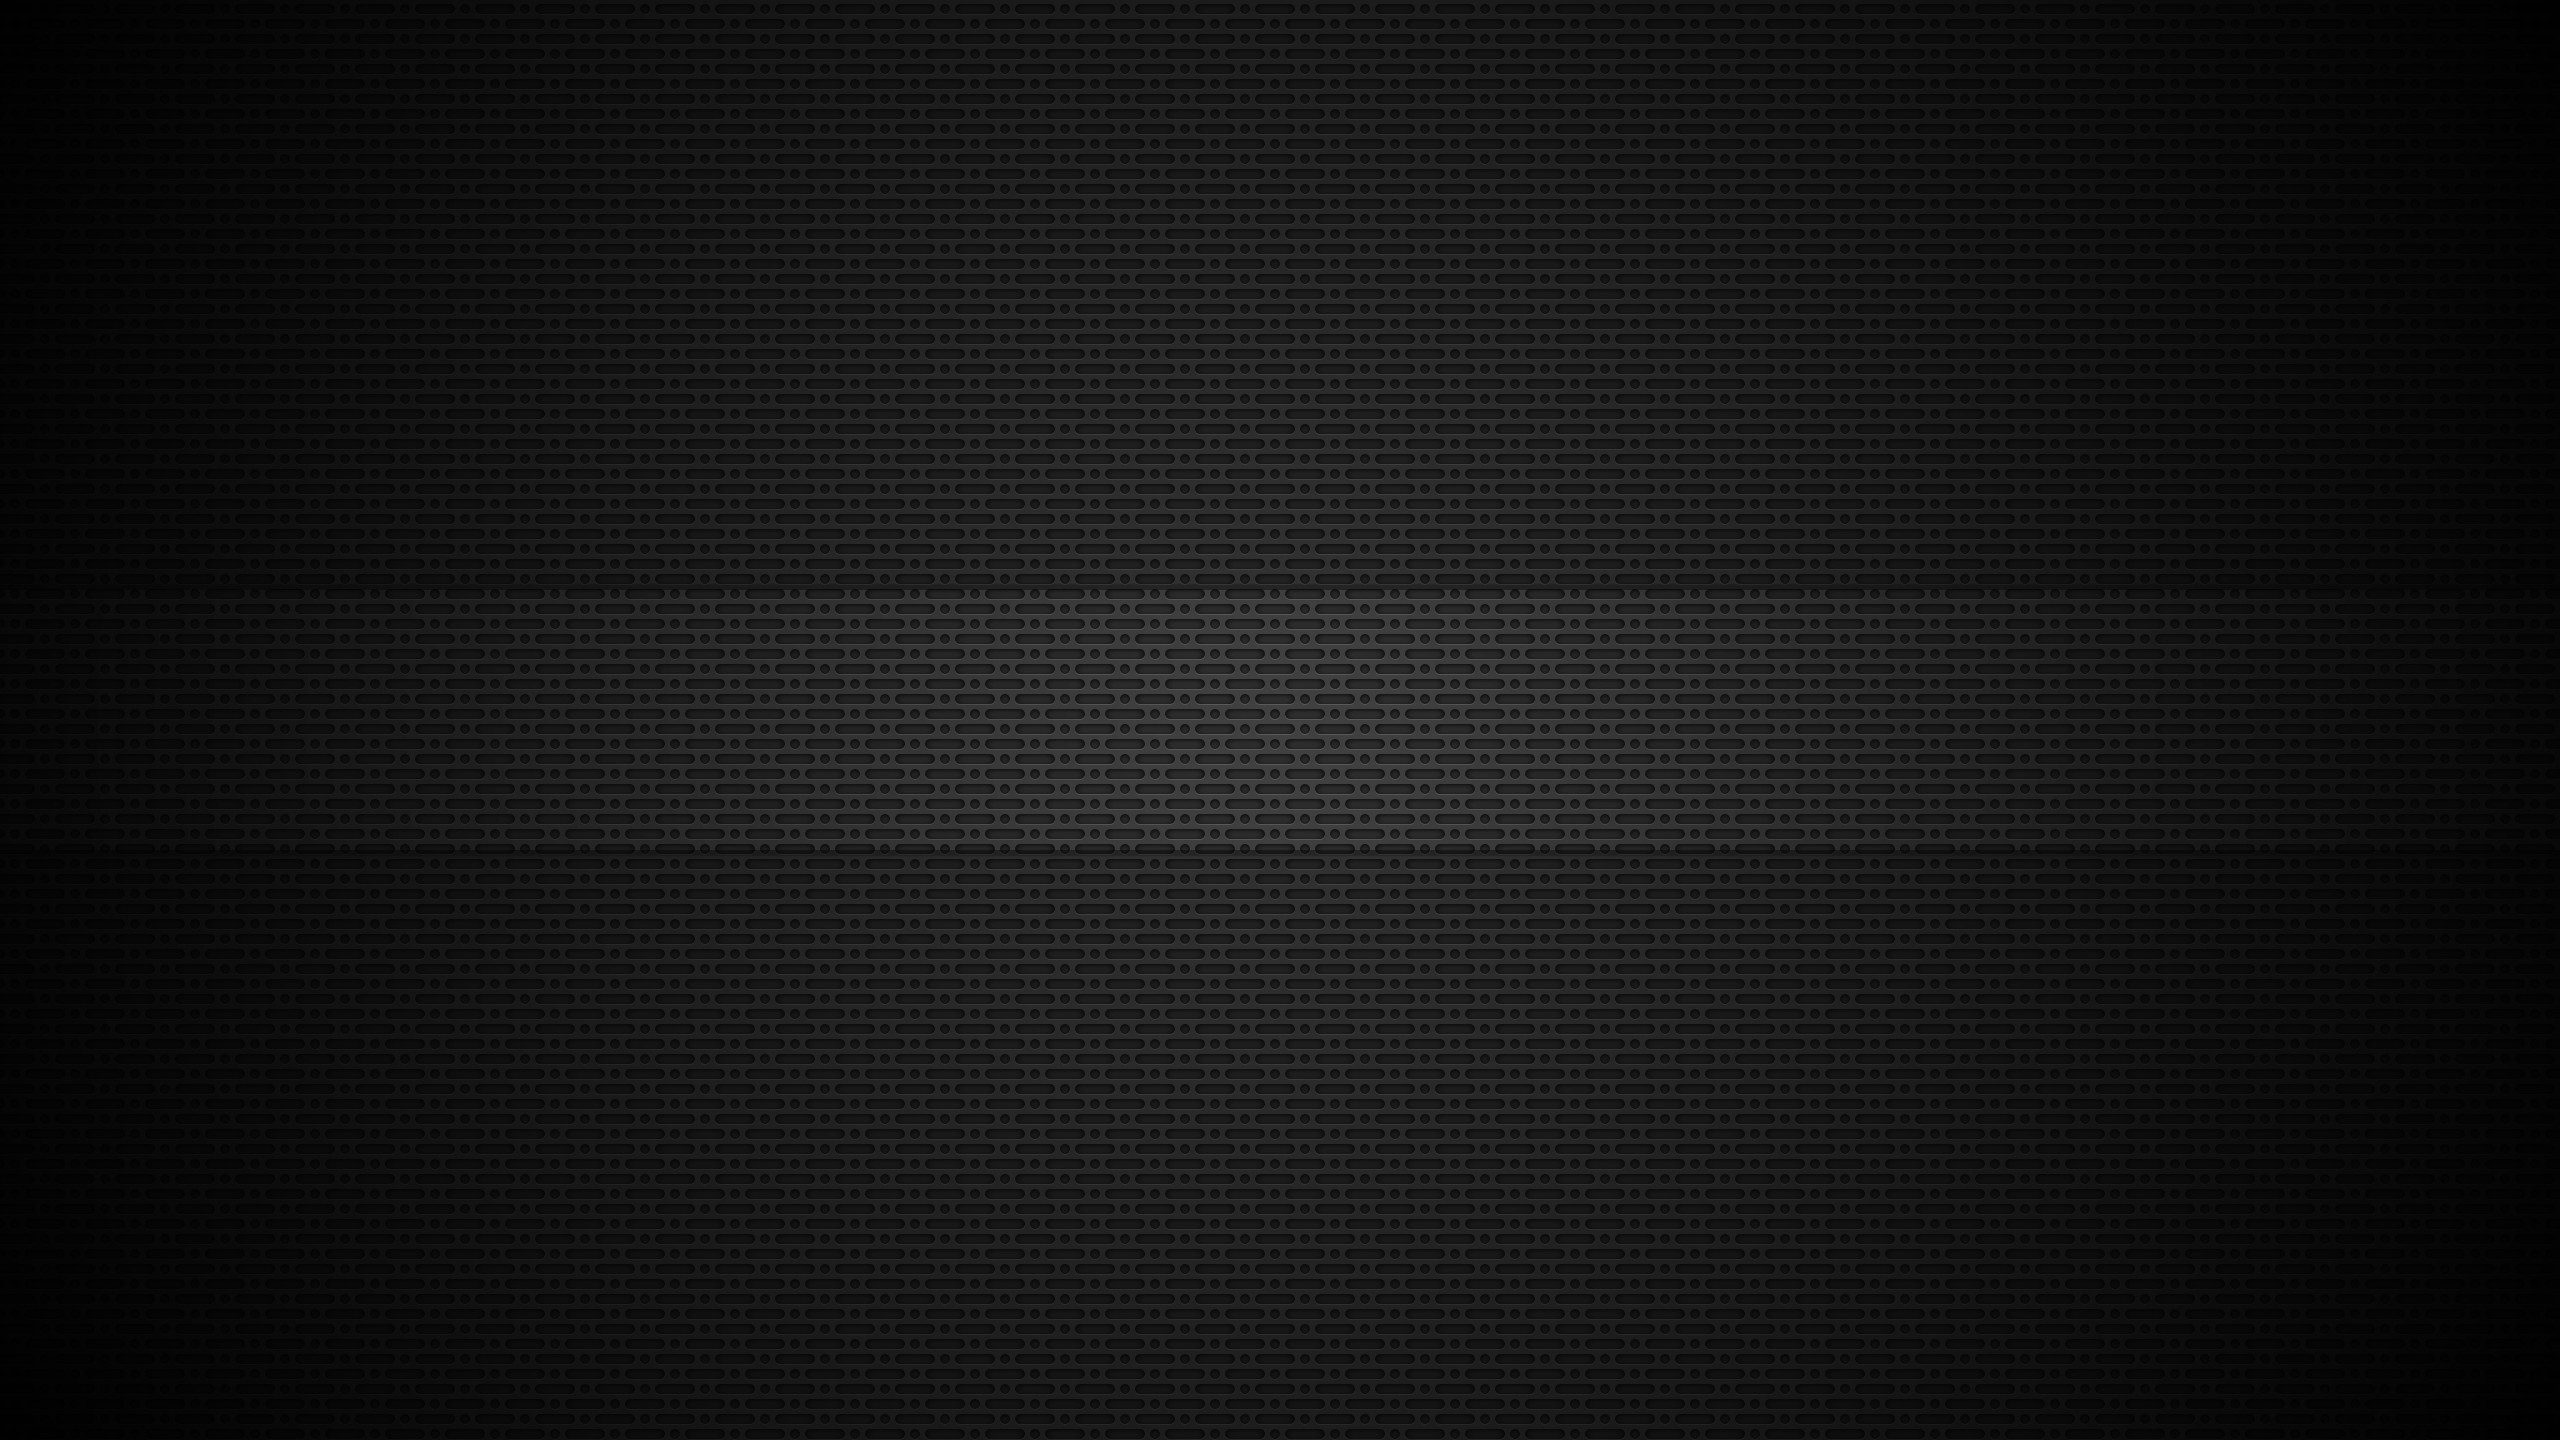 20 Free YouTube One Channel Art Designs | TubeGeeks